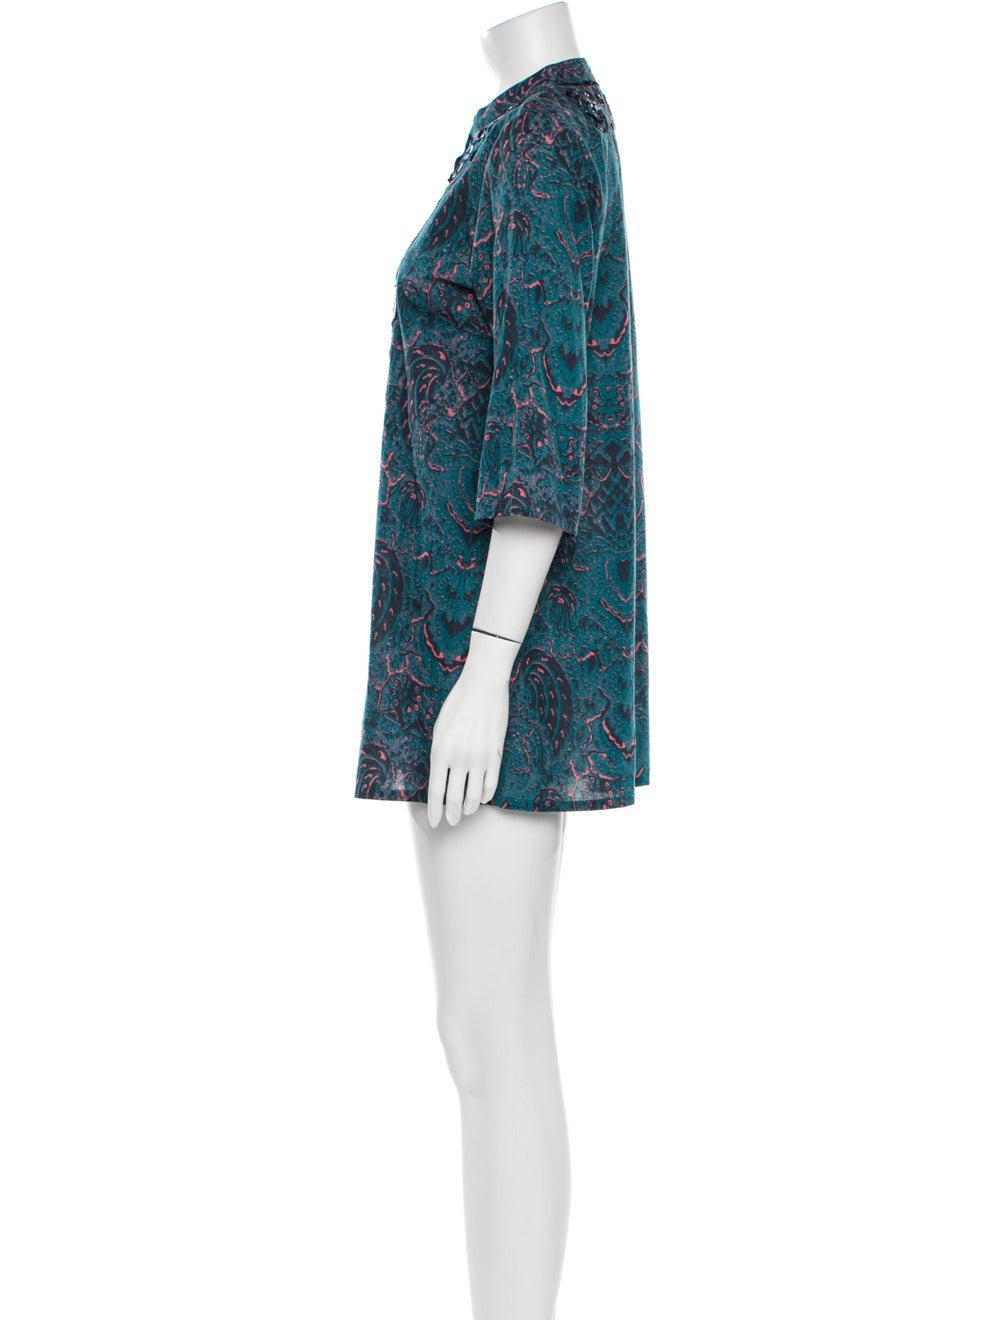 Figue Paisley Print Mini Dress - image 2